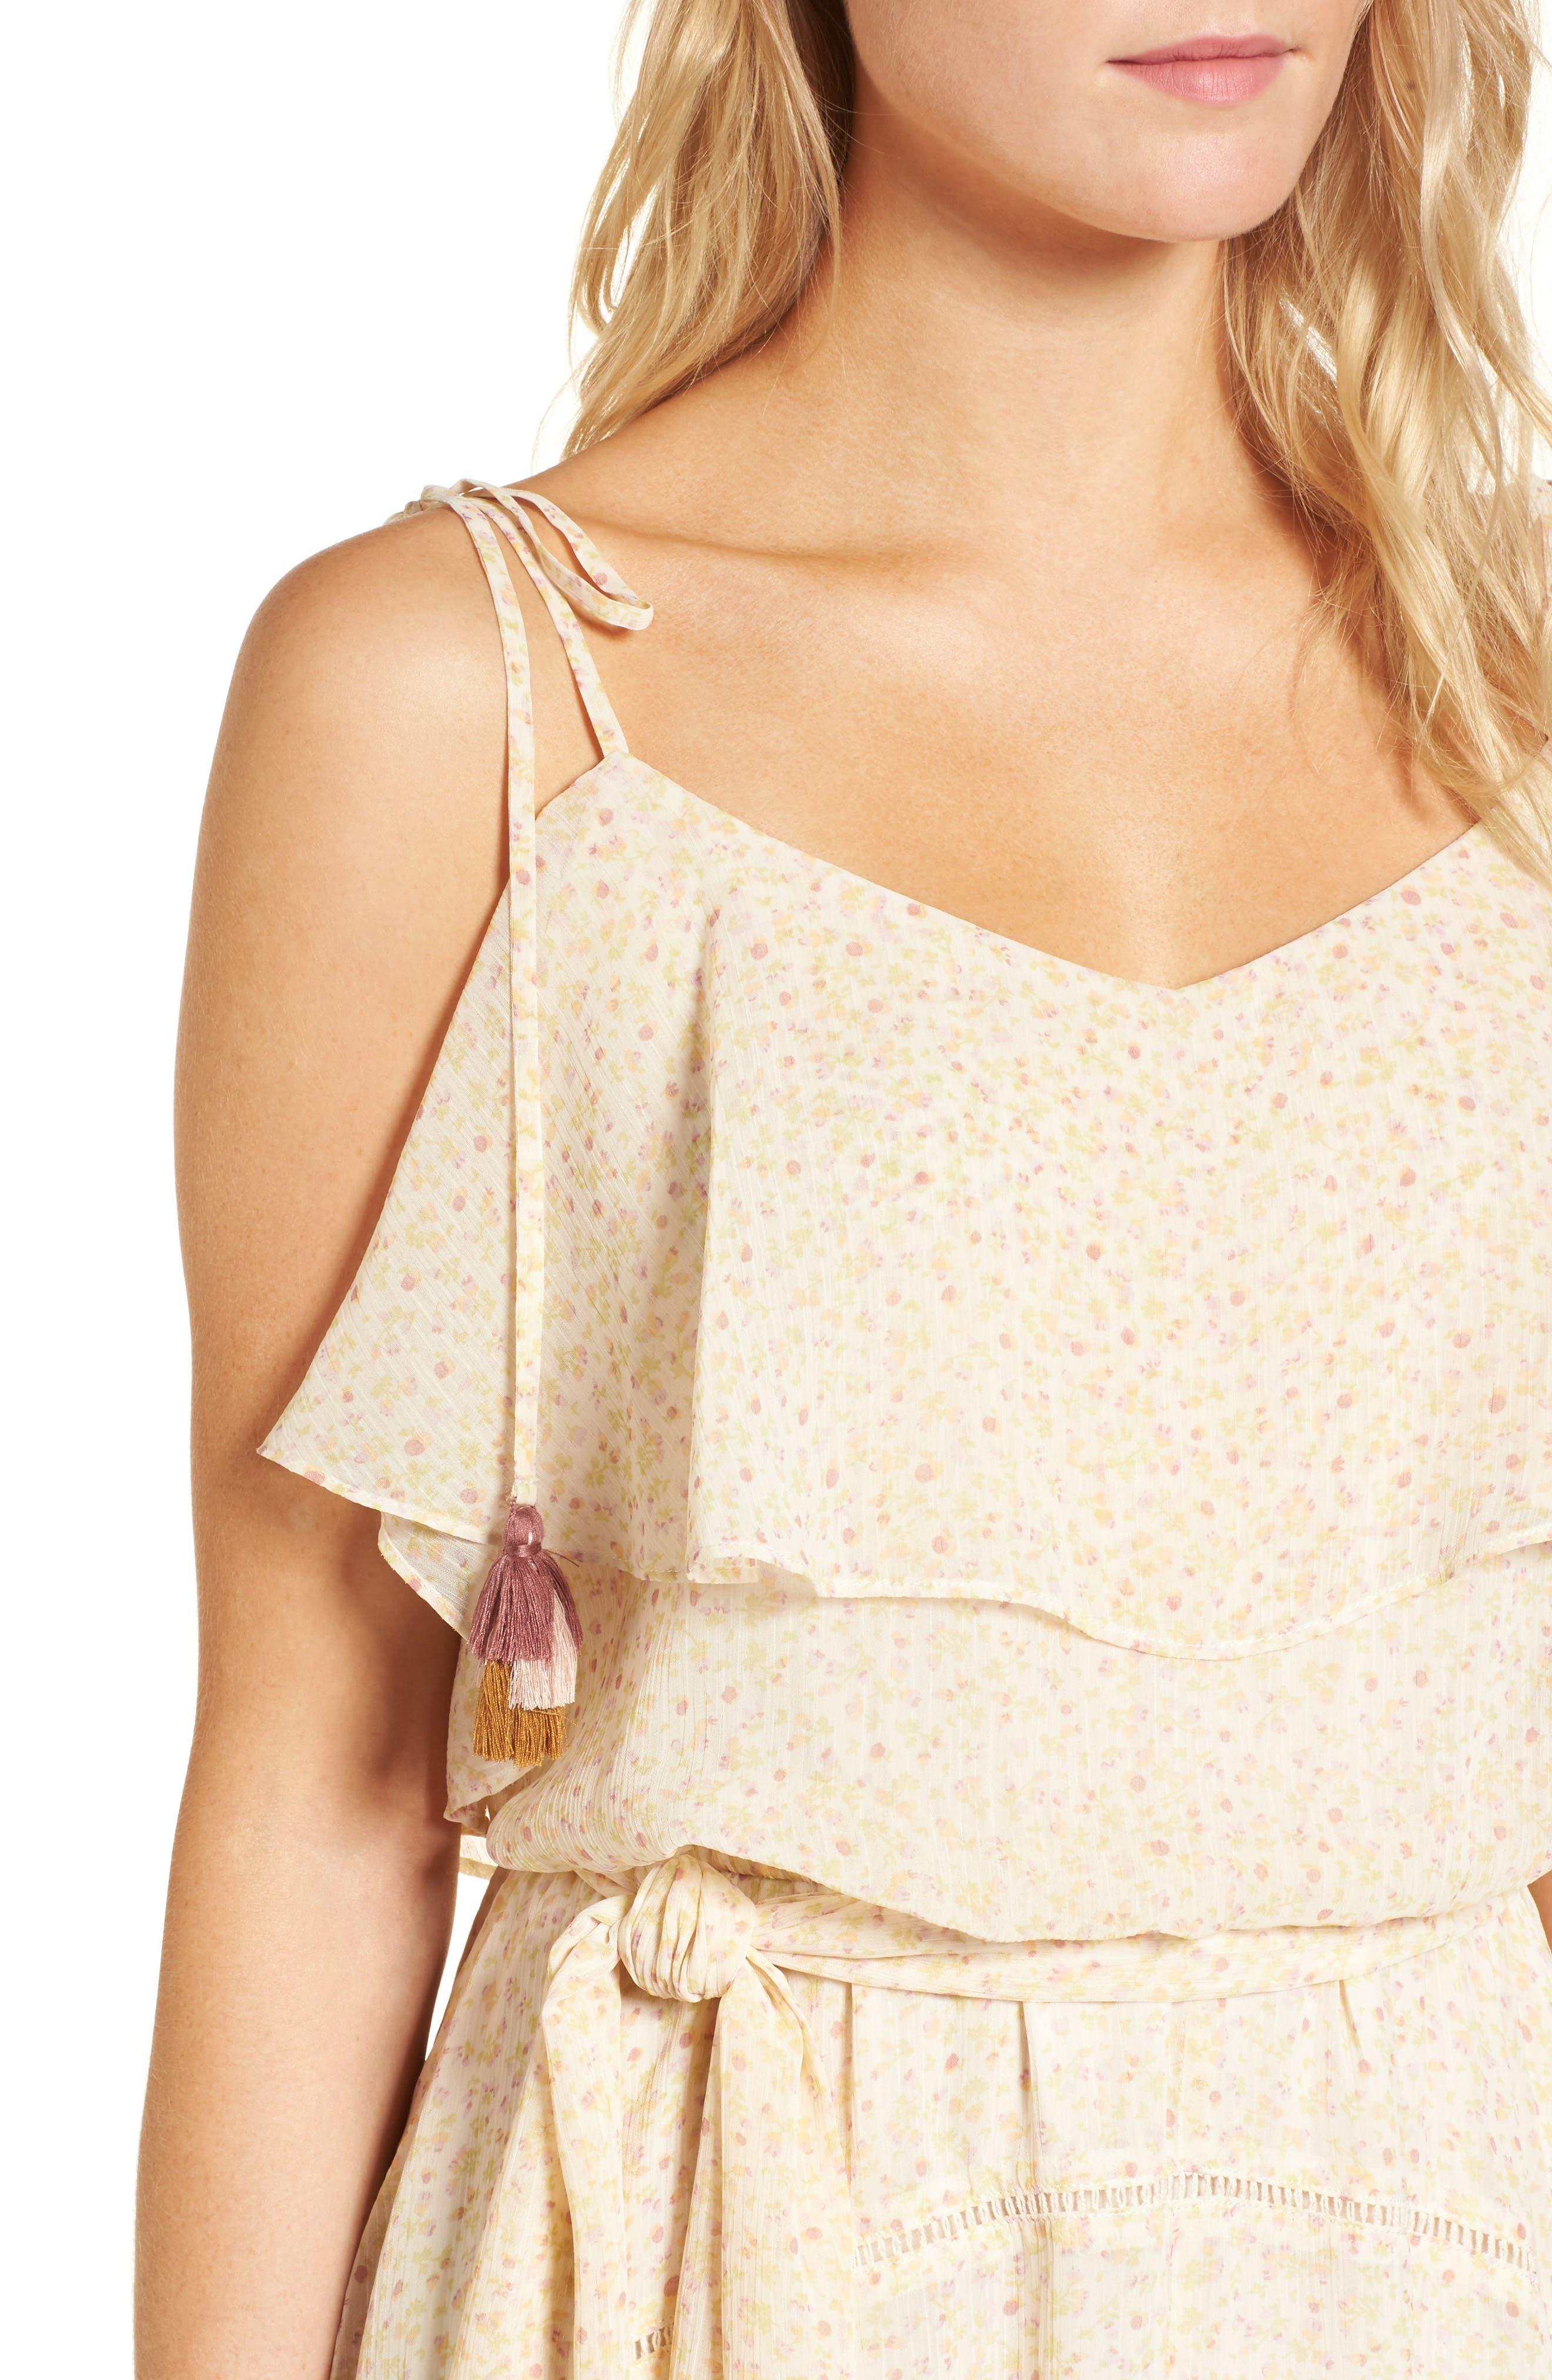 Decklan Maxi Dress,                             Alternate thumbnail 4, color,                             900